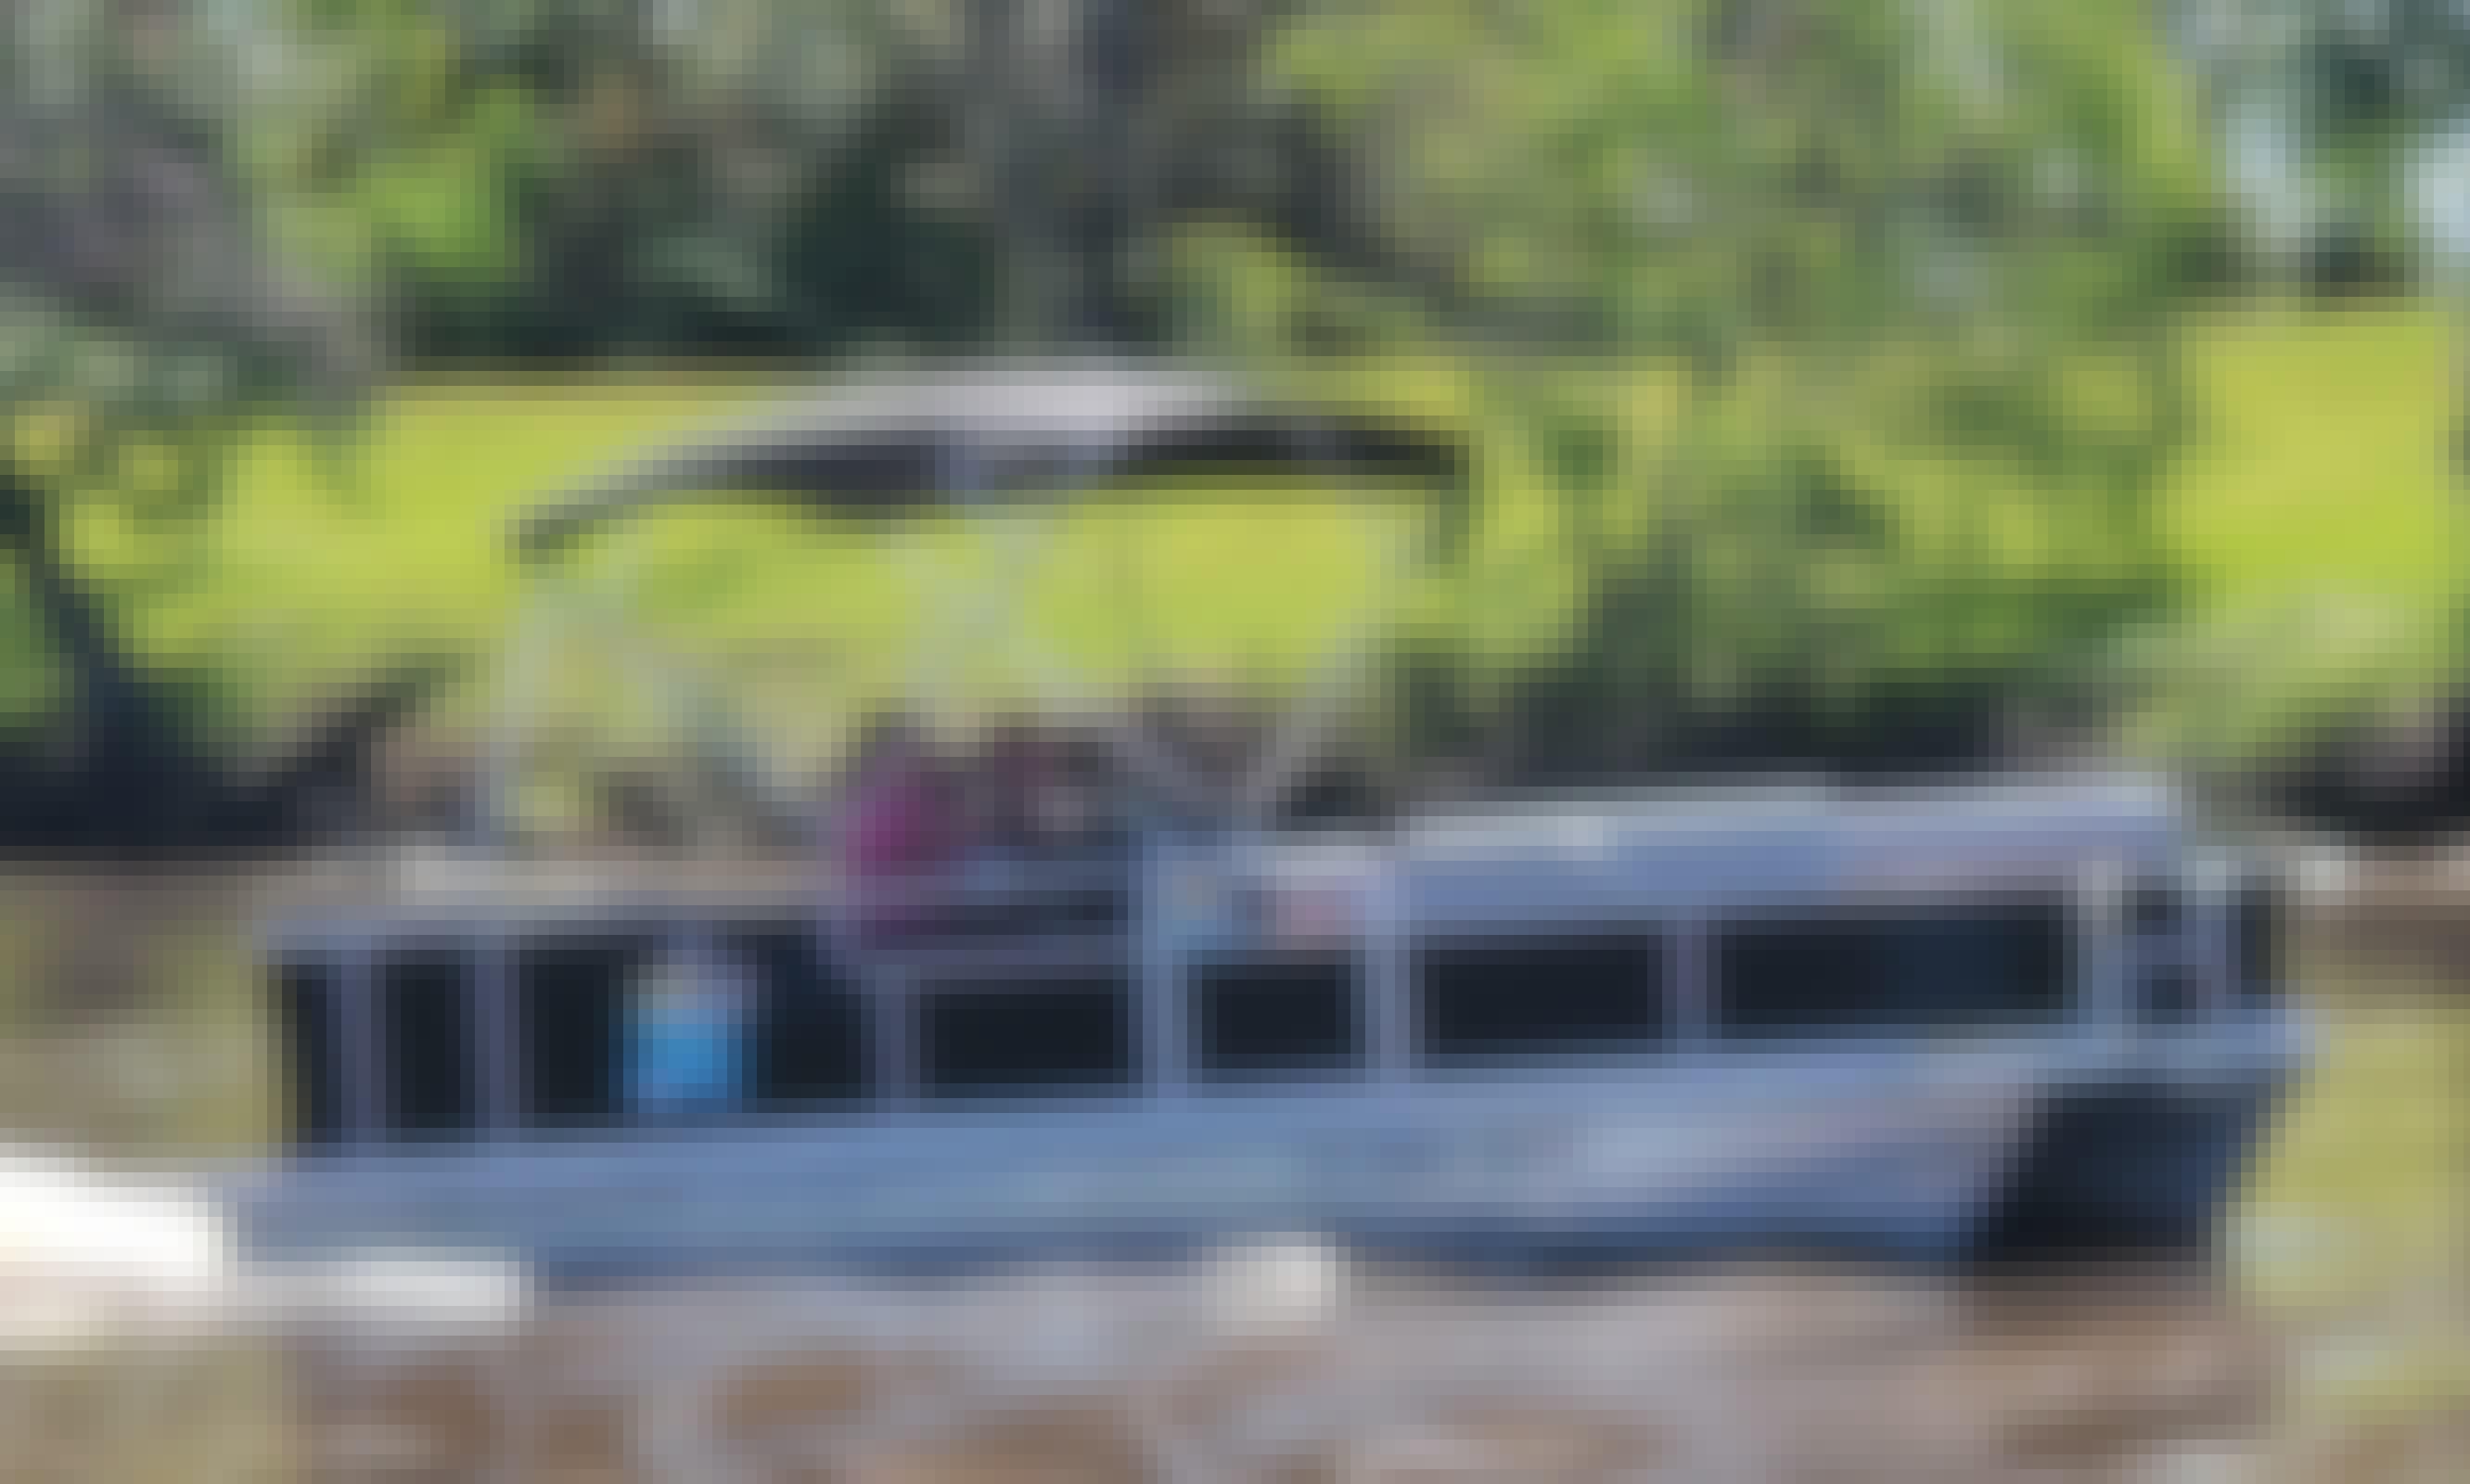 20' Sunchaser Pontoon Boat rental on Lake Charles